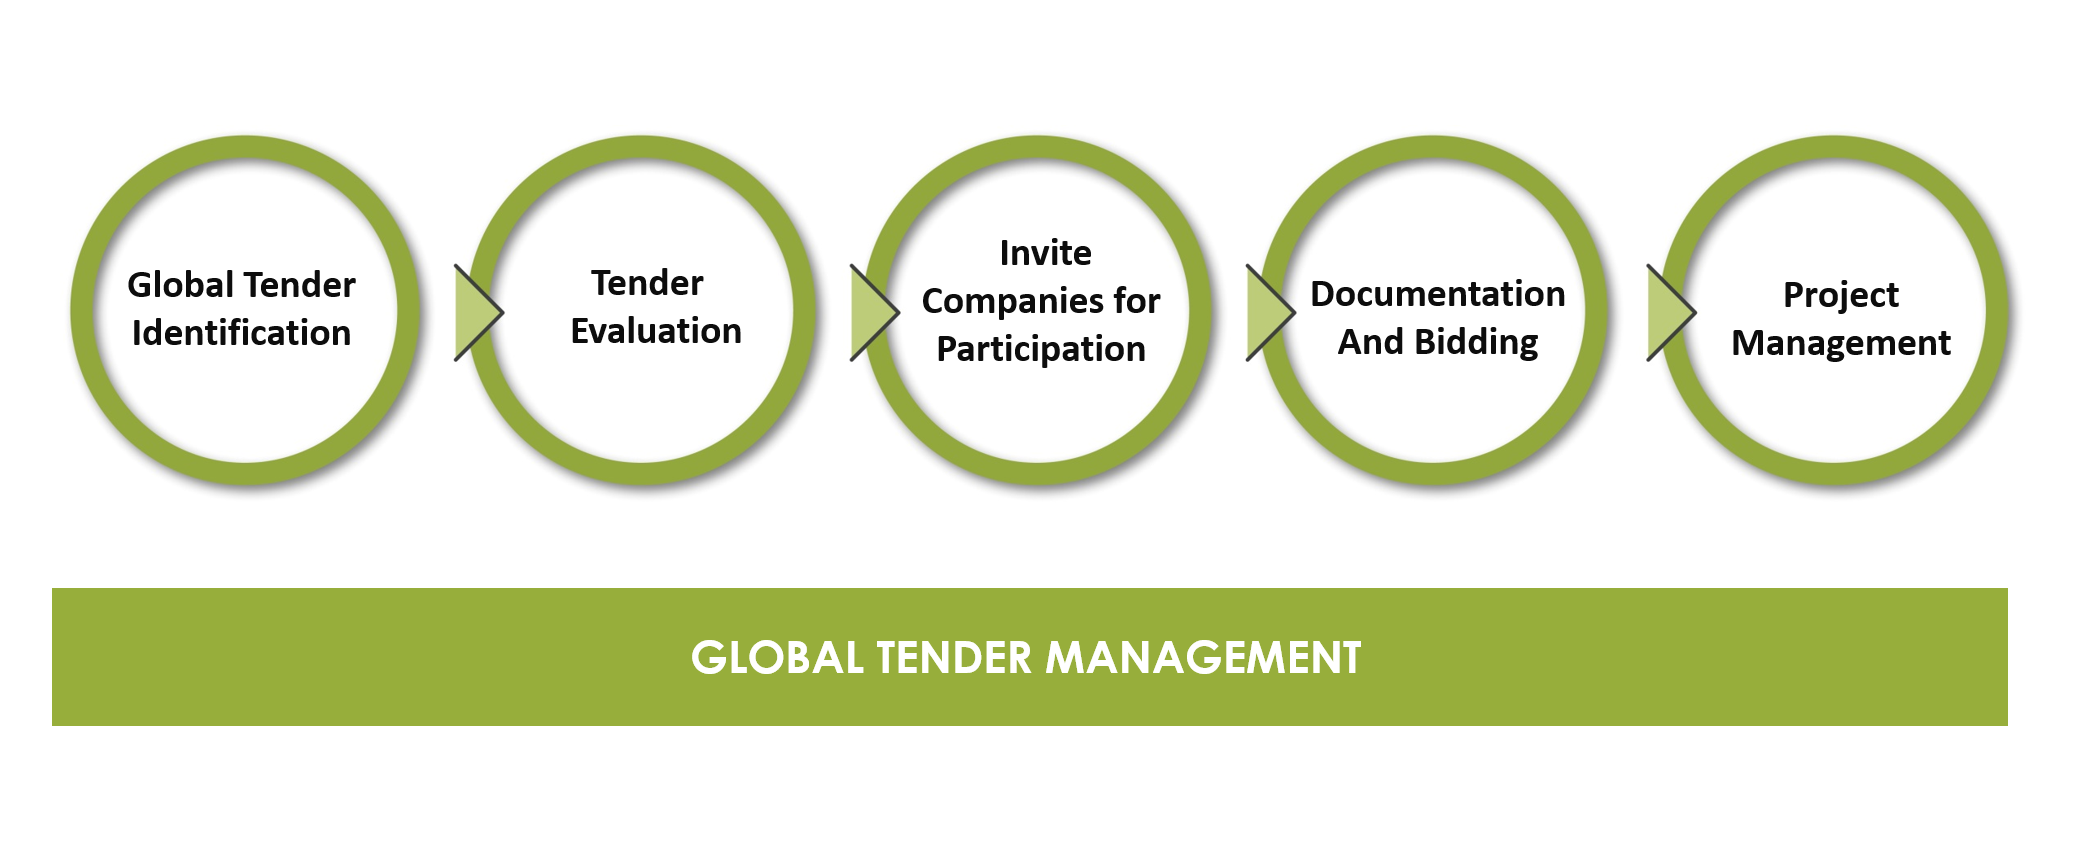 Global Tenders Management | Bidding Process | Wevio™